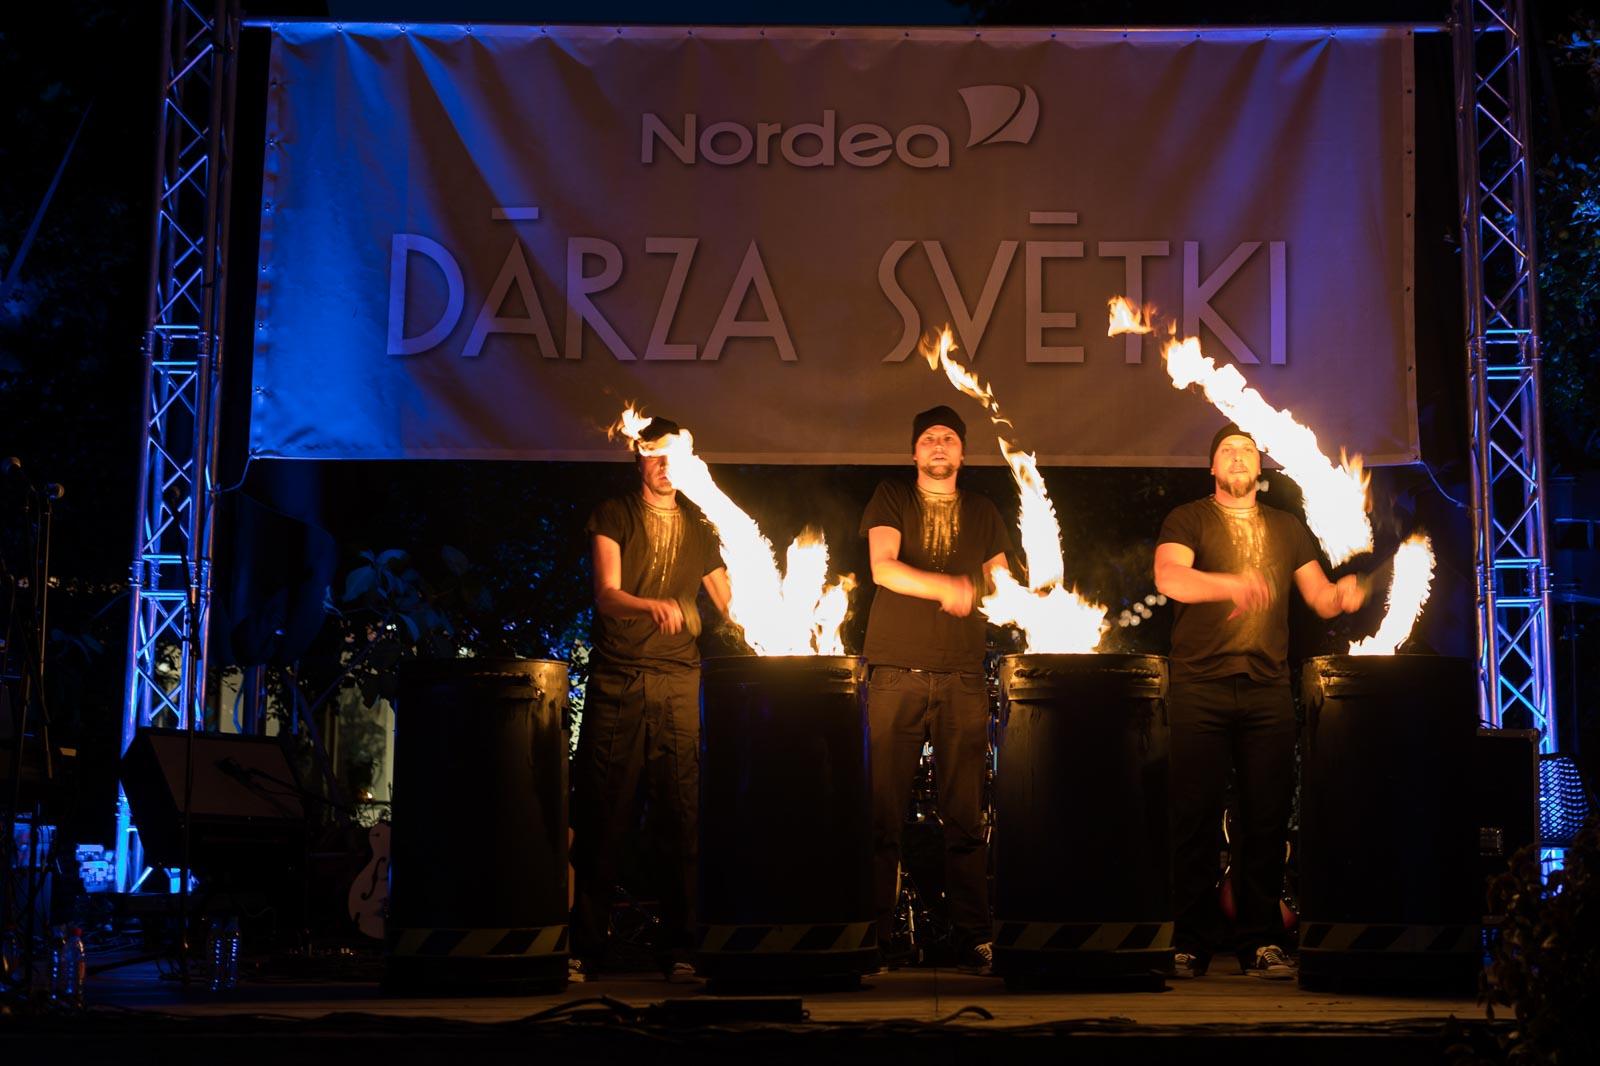 Nordea_DarzaSvetki_s-476